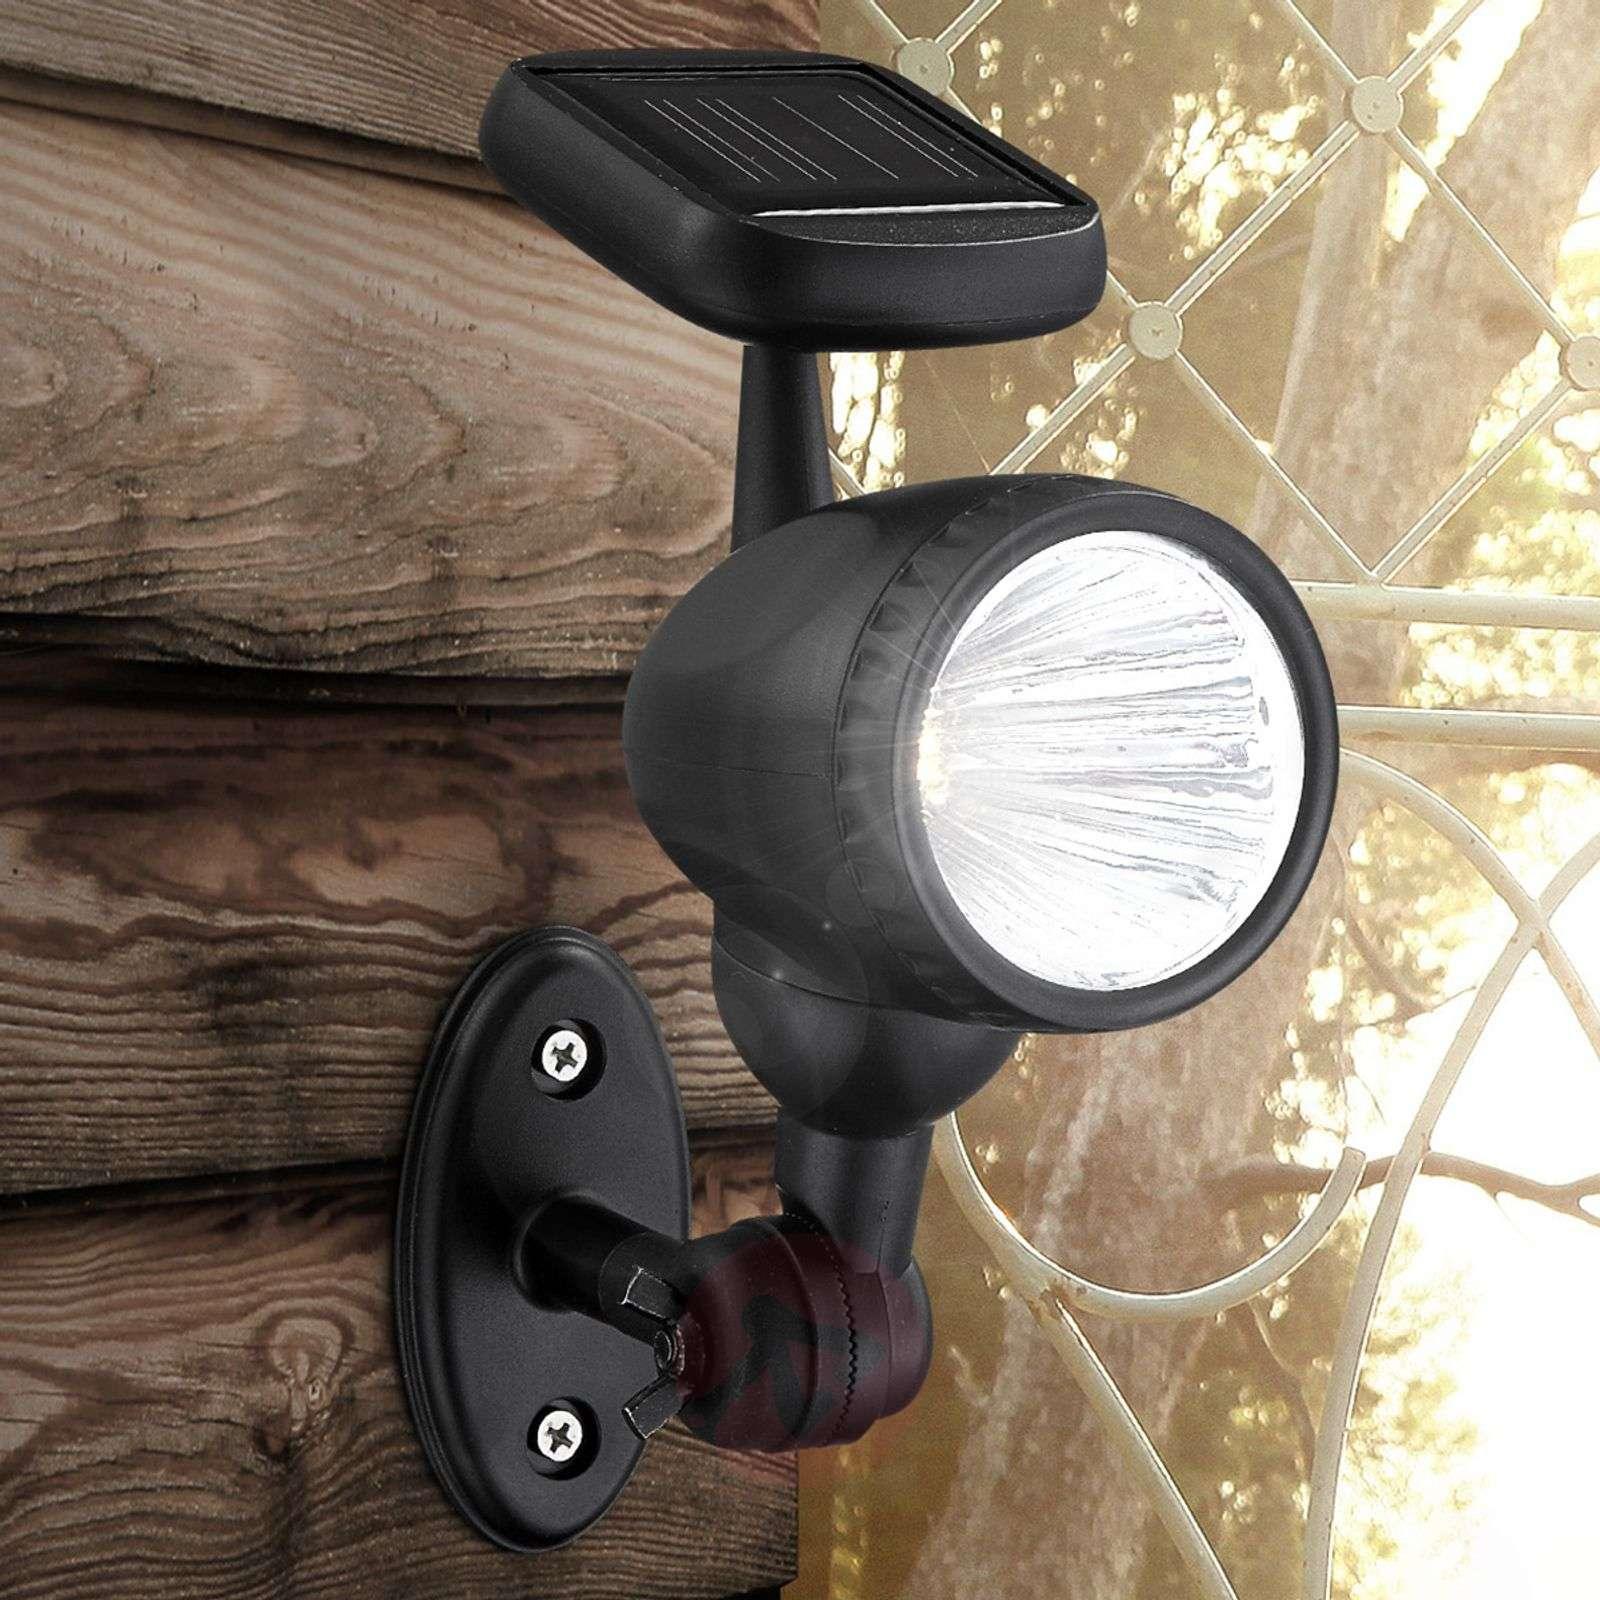 Solar outdoor wall light Mawe-4014993-01